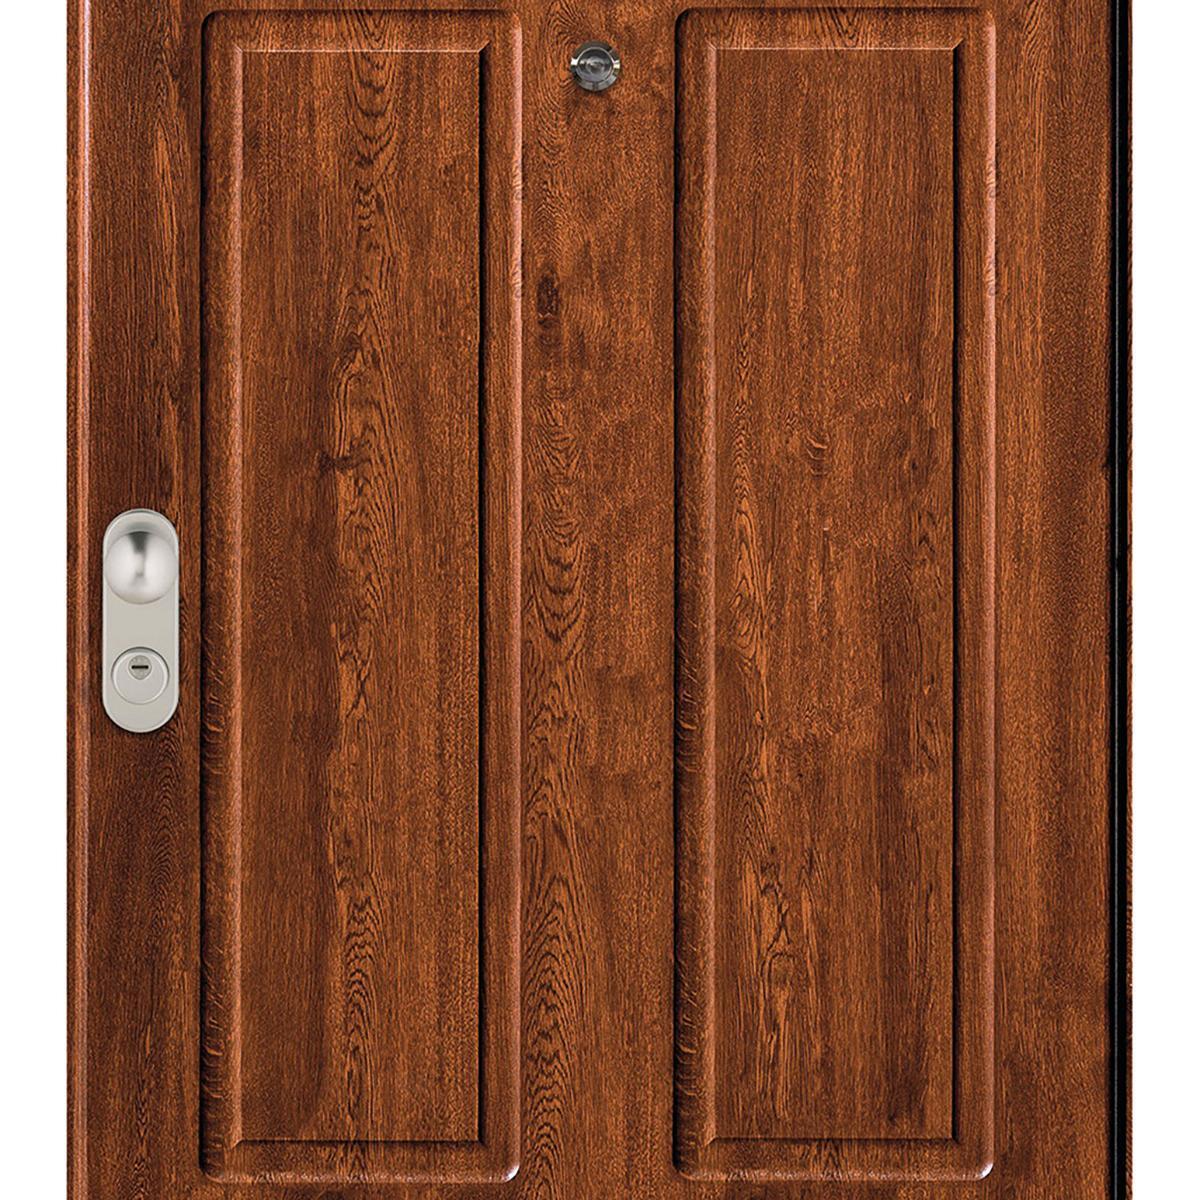 Porta blindata Iro noce L 90 x H 210 cm destra - 4